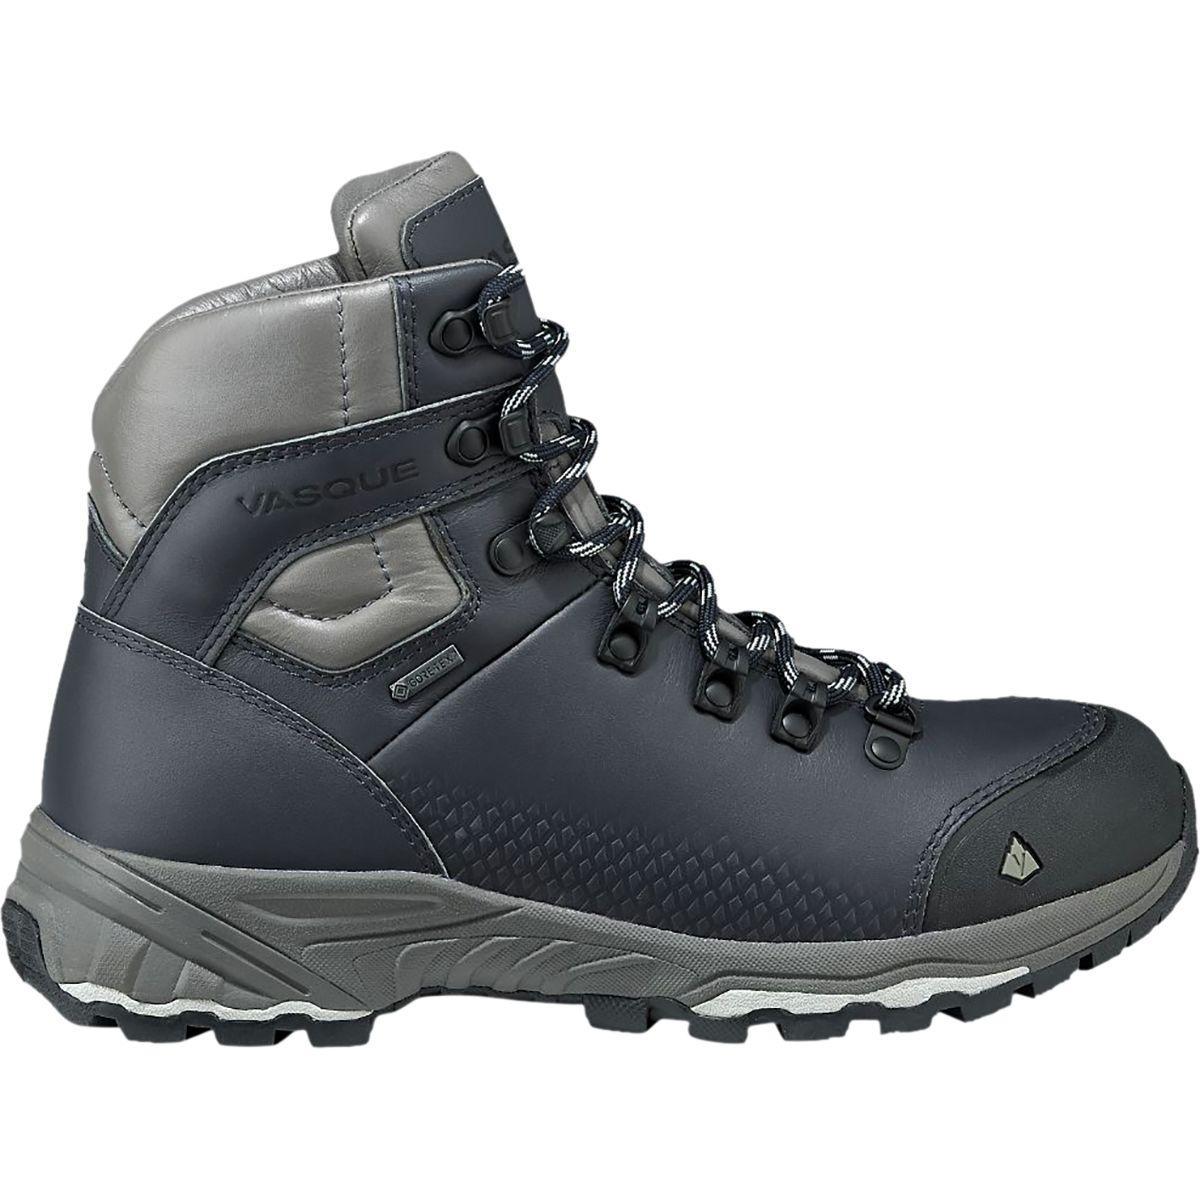 adf7d240caf Lyst - Vasque St Elias Fg Gtx Hiking Boot in Blue